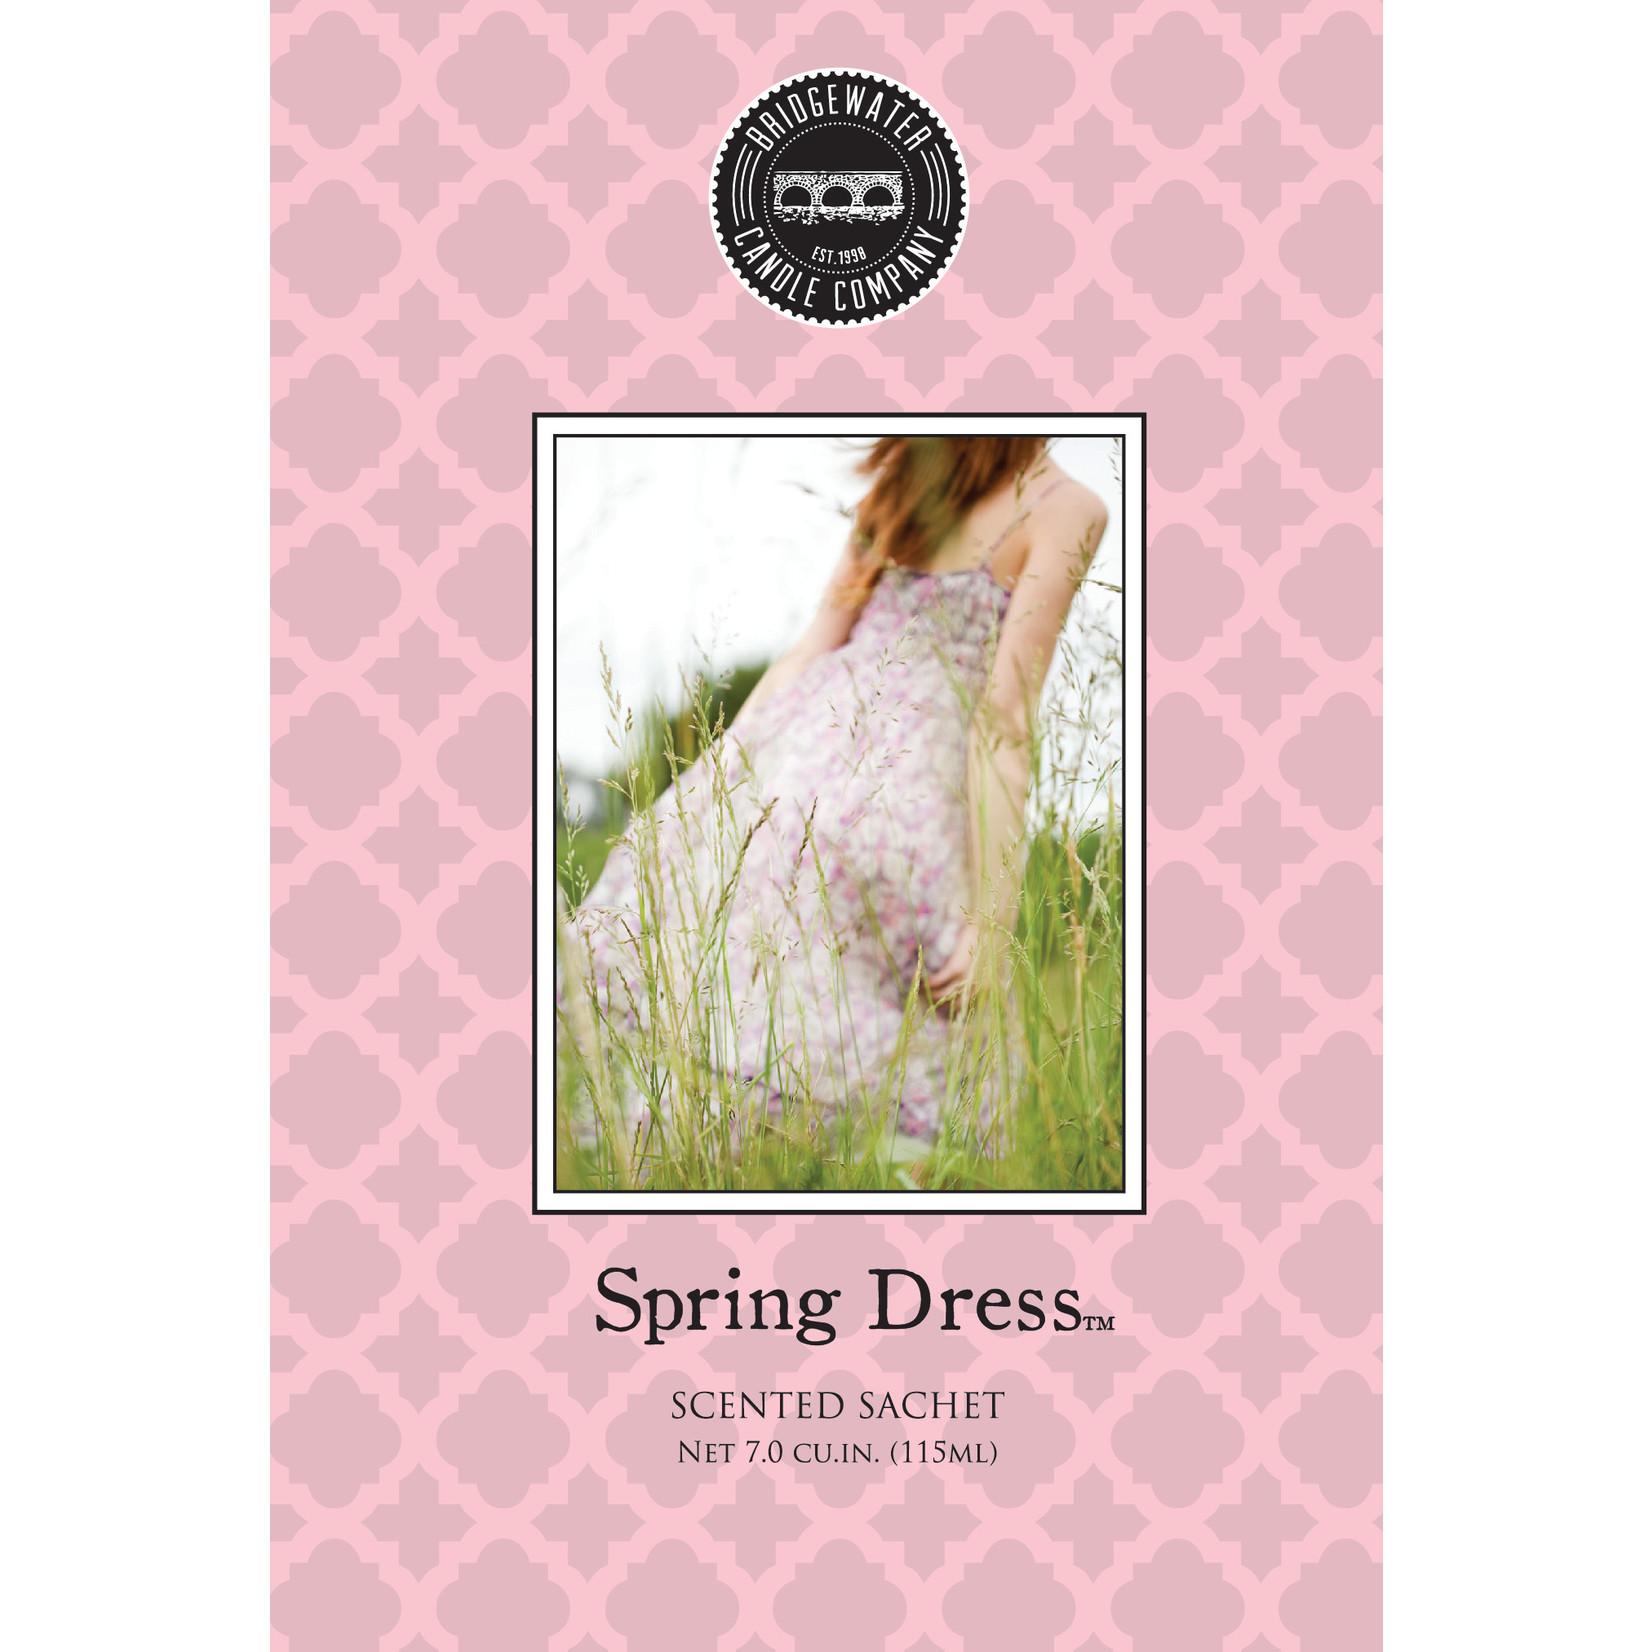 Bridgewater Scented Sachet / Geurzakje Spring Dress